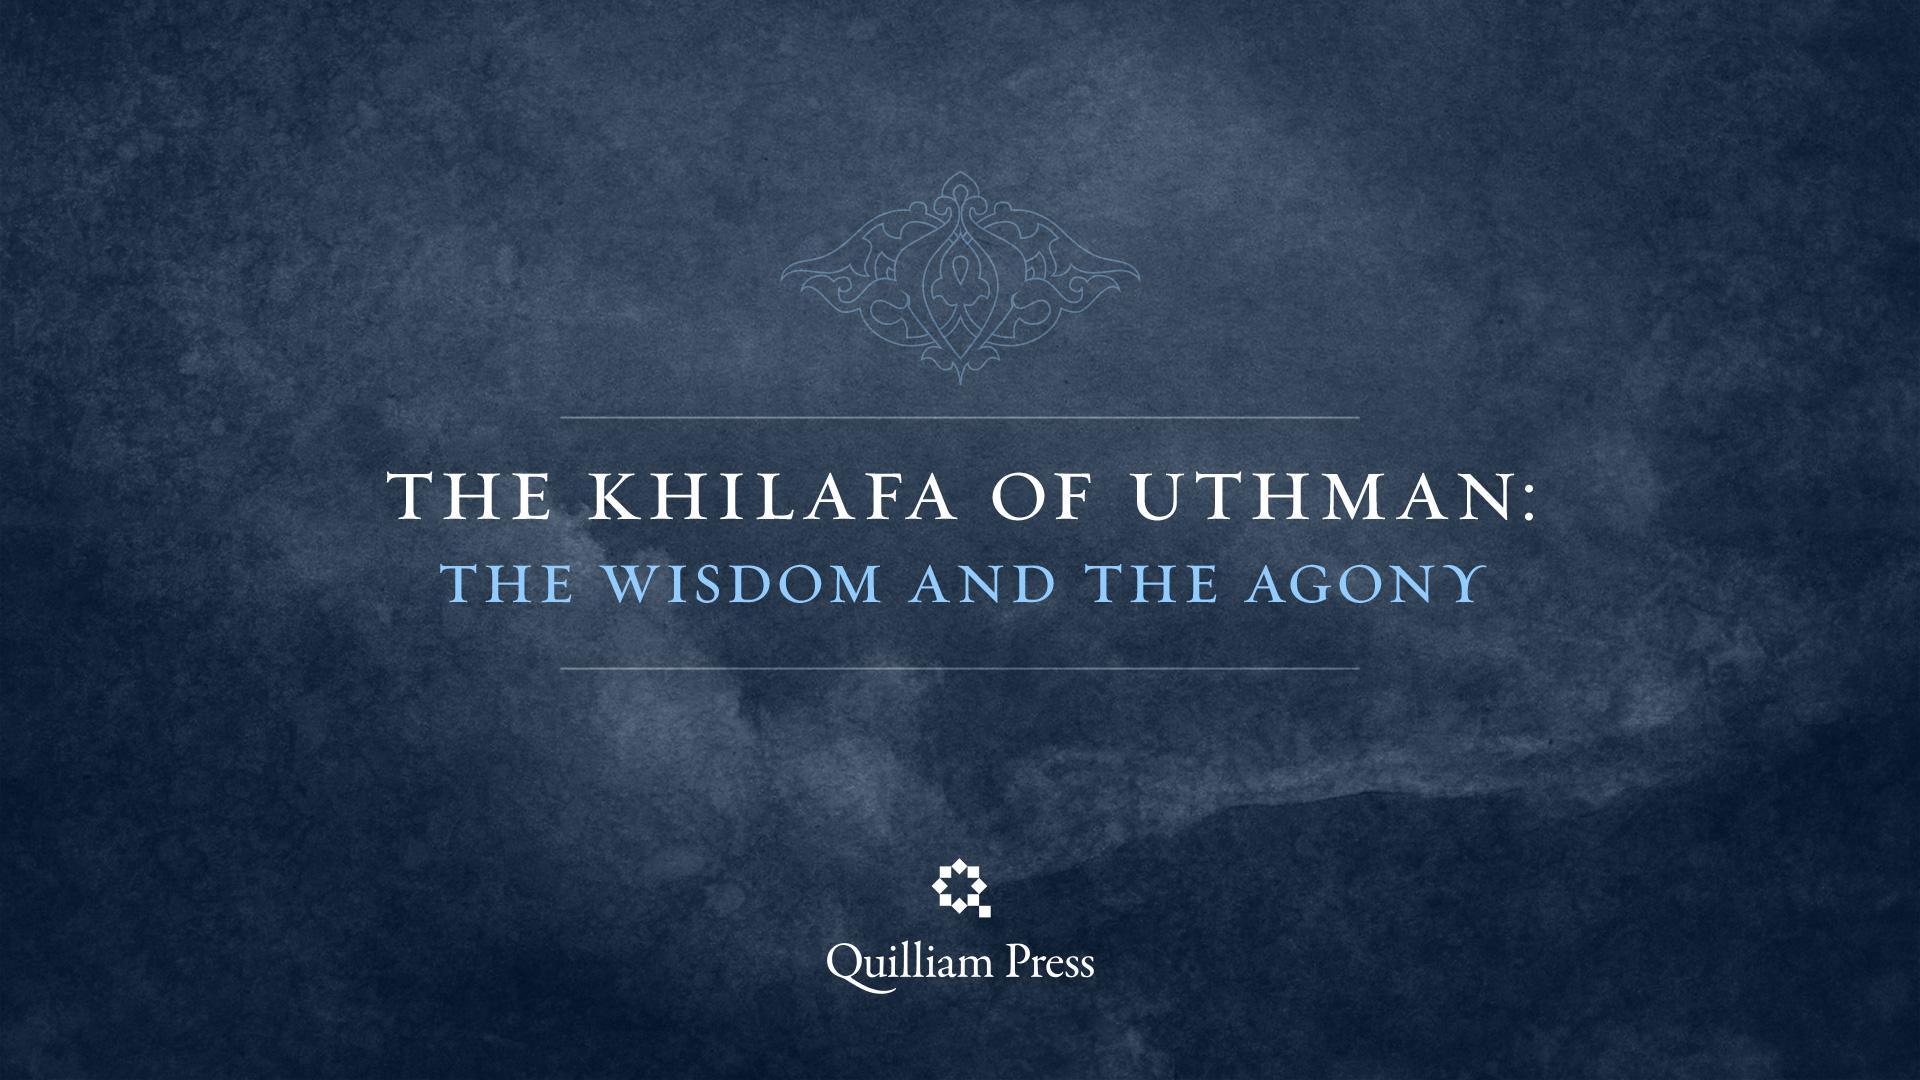 Quilliam_Press_Khilafa_Series_03.jpg